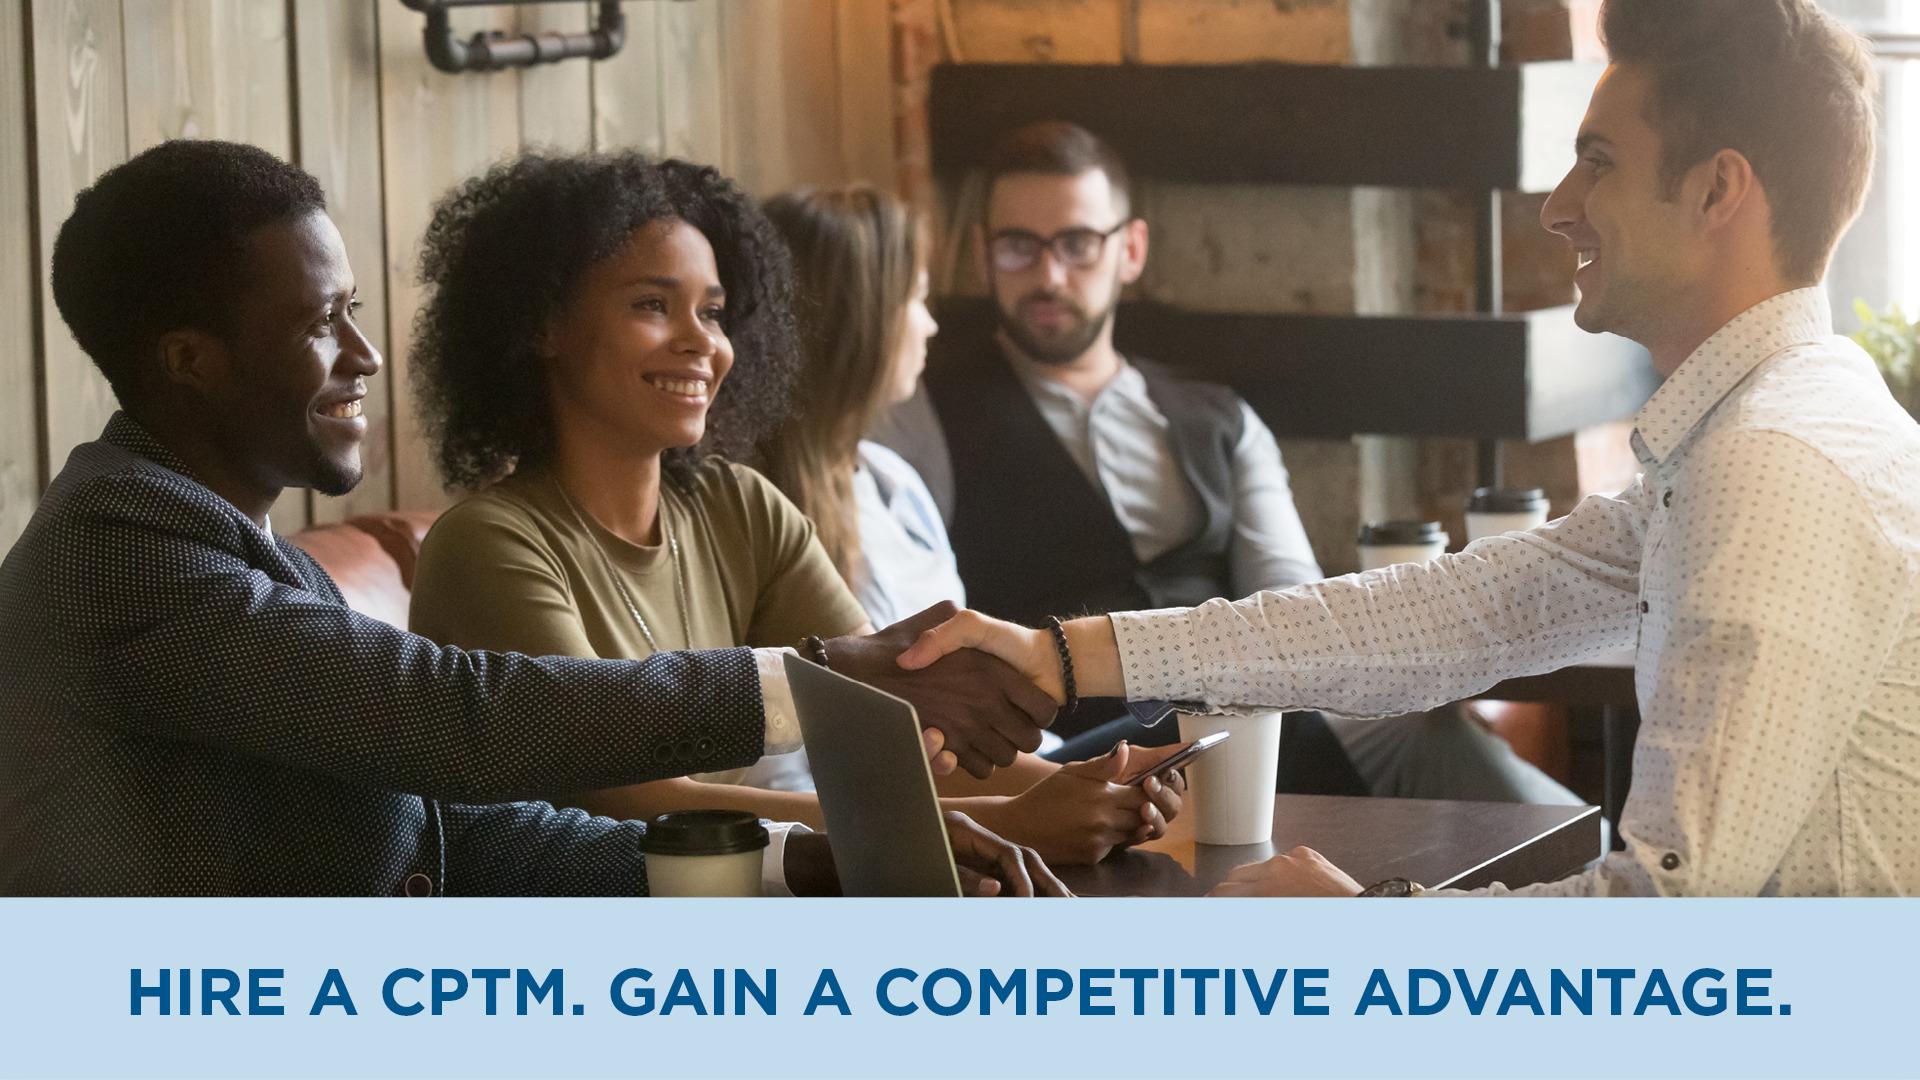 Hire a CPTM. Gain a Competitive Advantage.